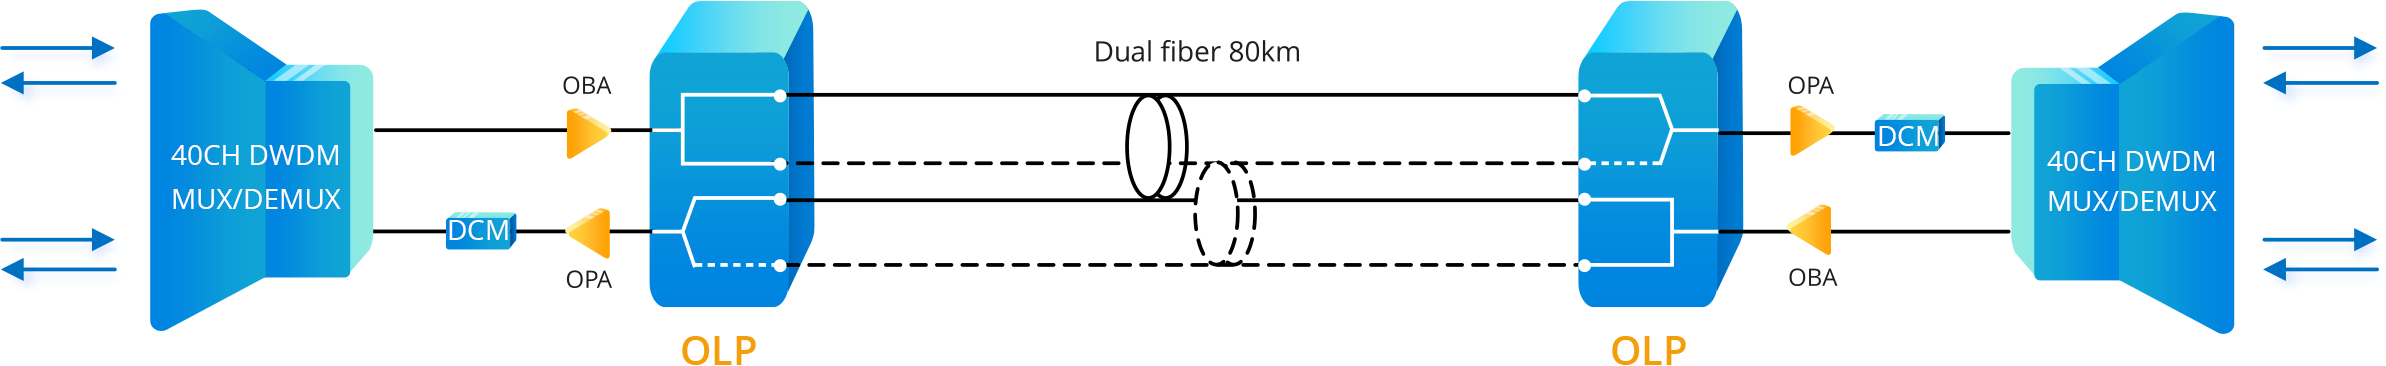 optical line protection